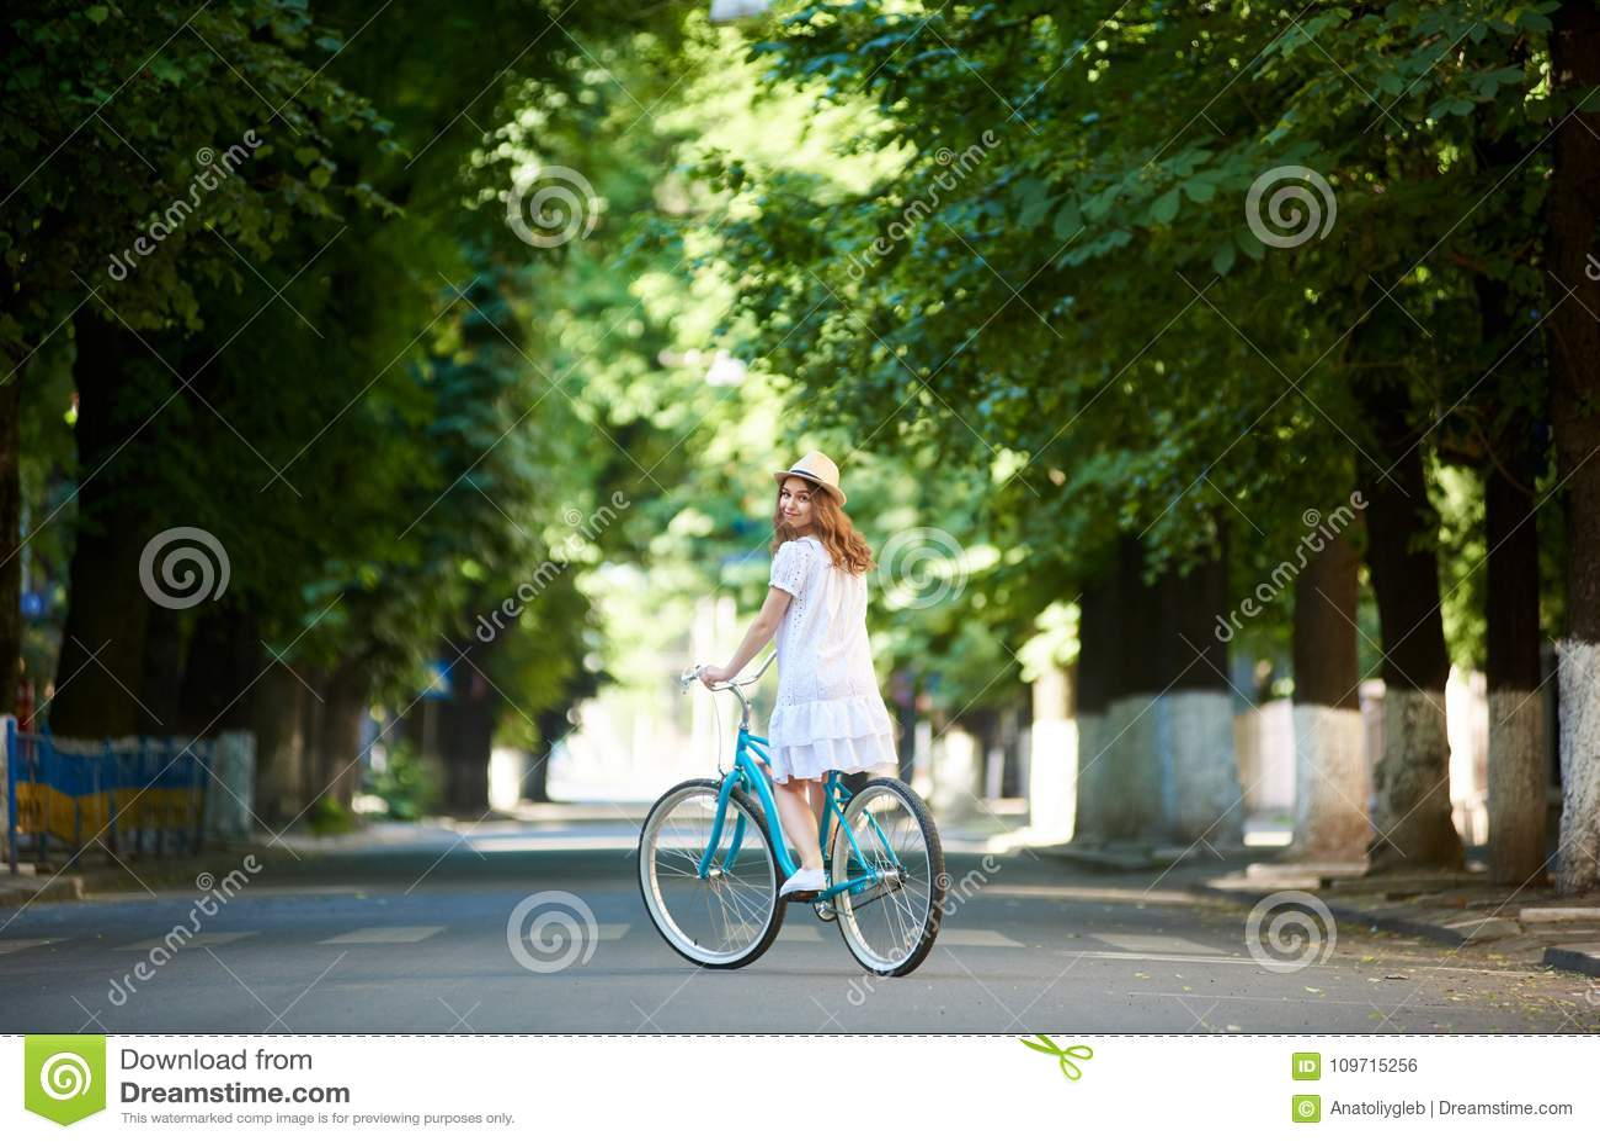 Green urban plantings. Female rides on bike alone at road